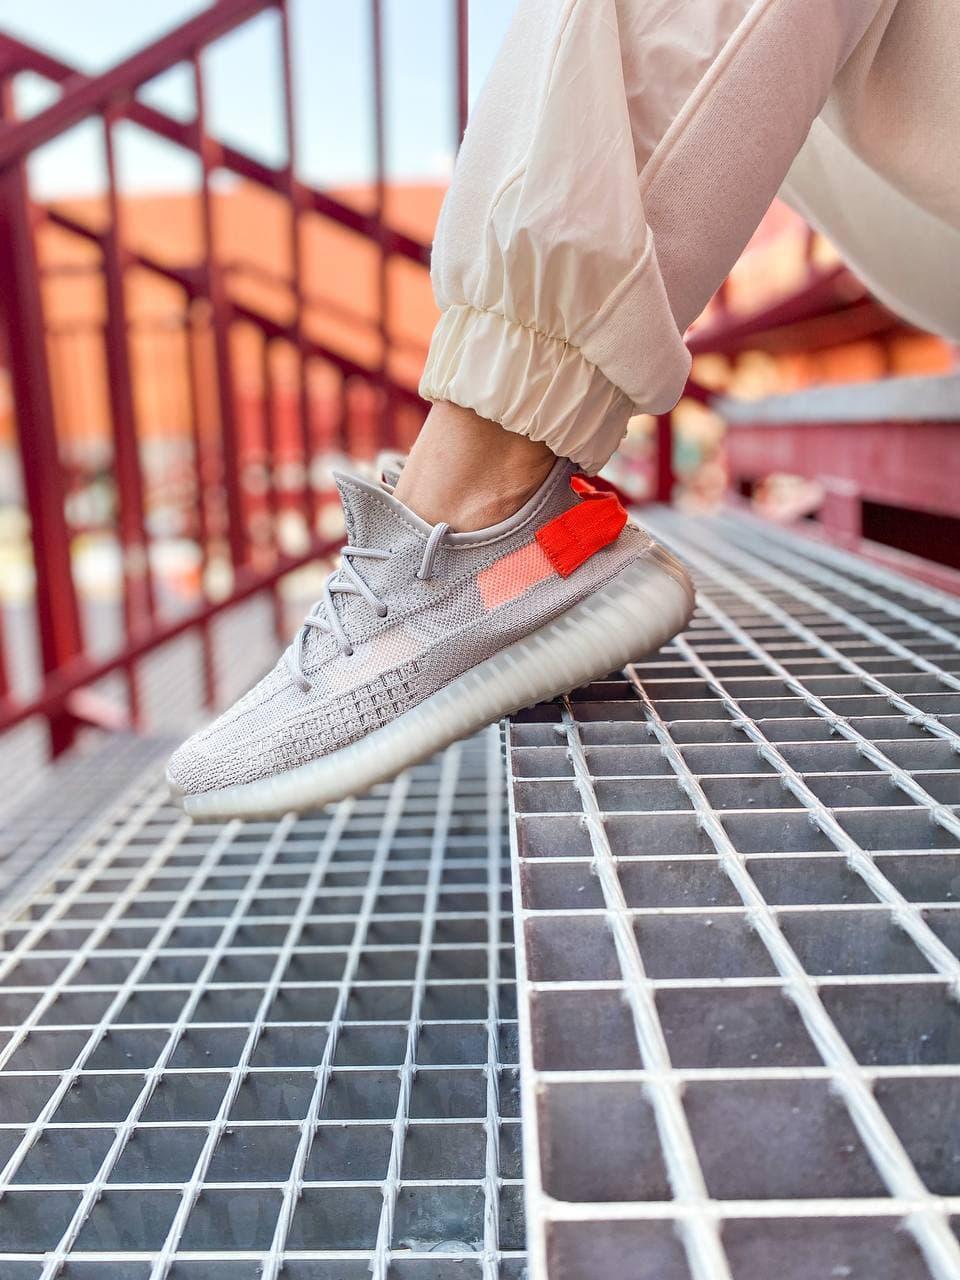 Жіночі кросівки Adidas Yeezy Boost 350 V2 Tail Light (сірі) К2770 якісні круті взуття